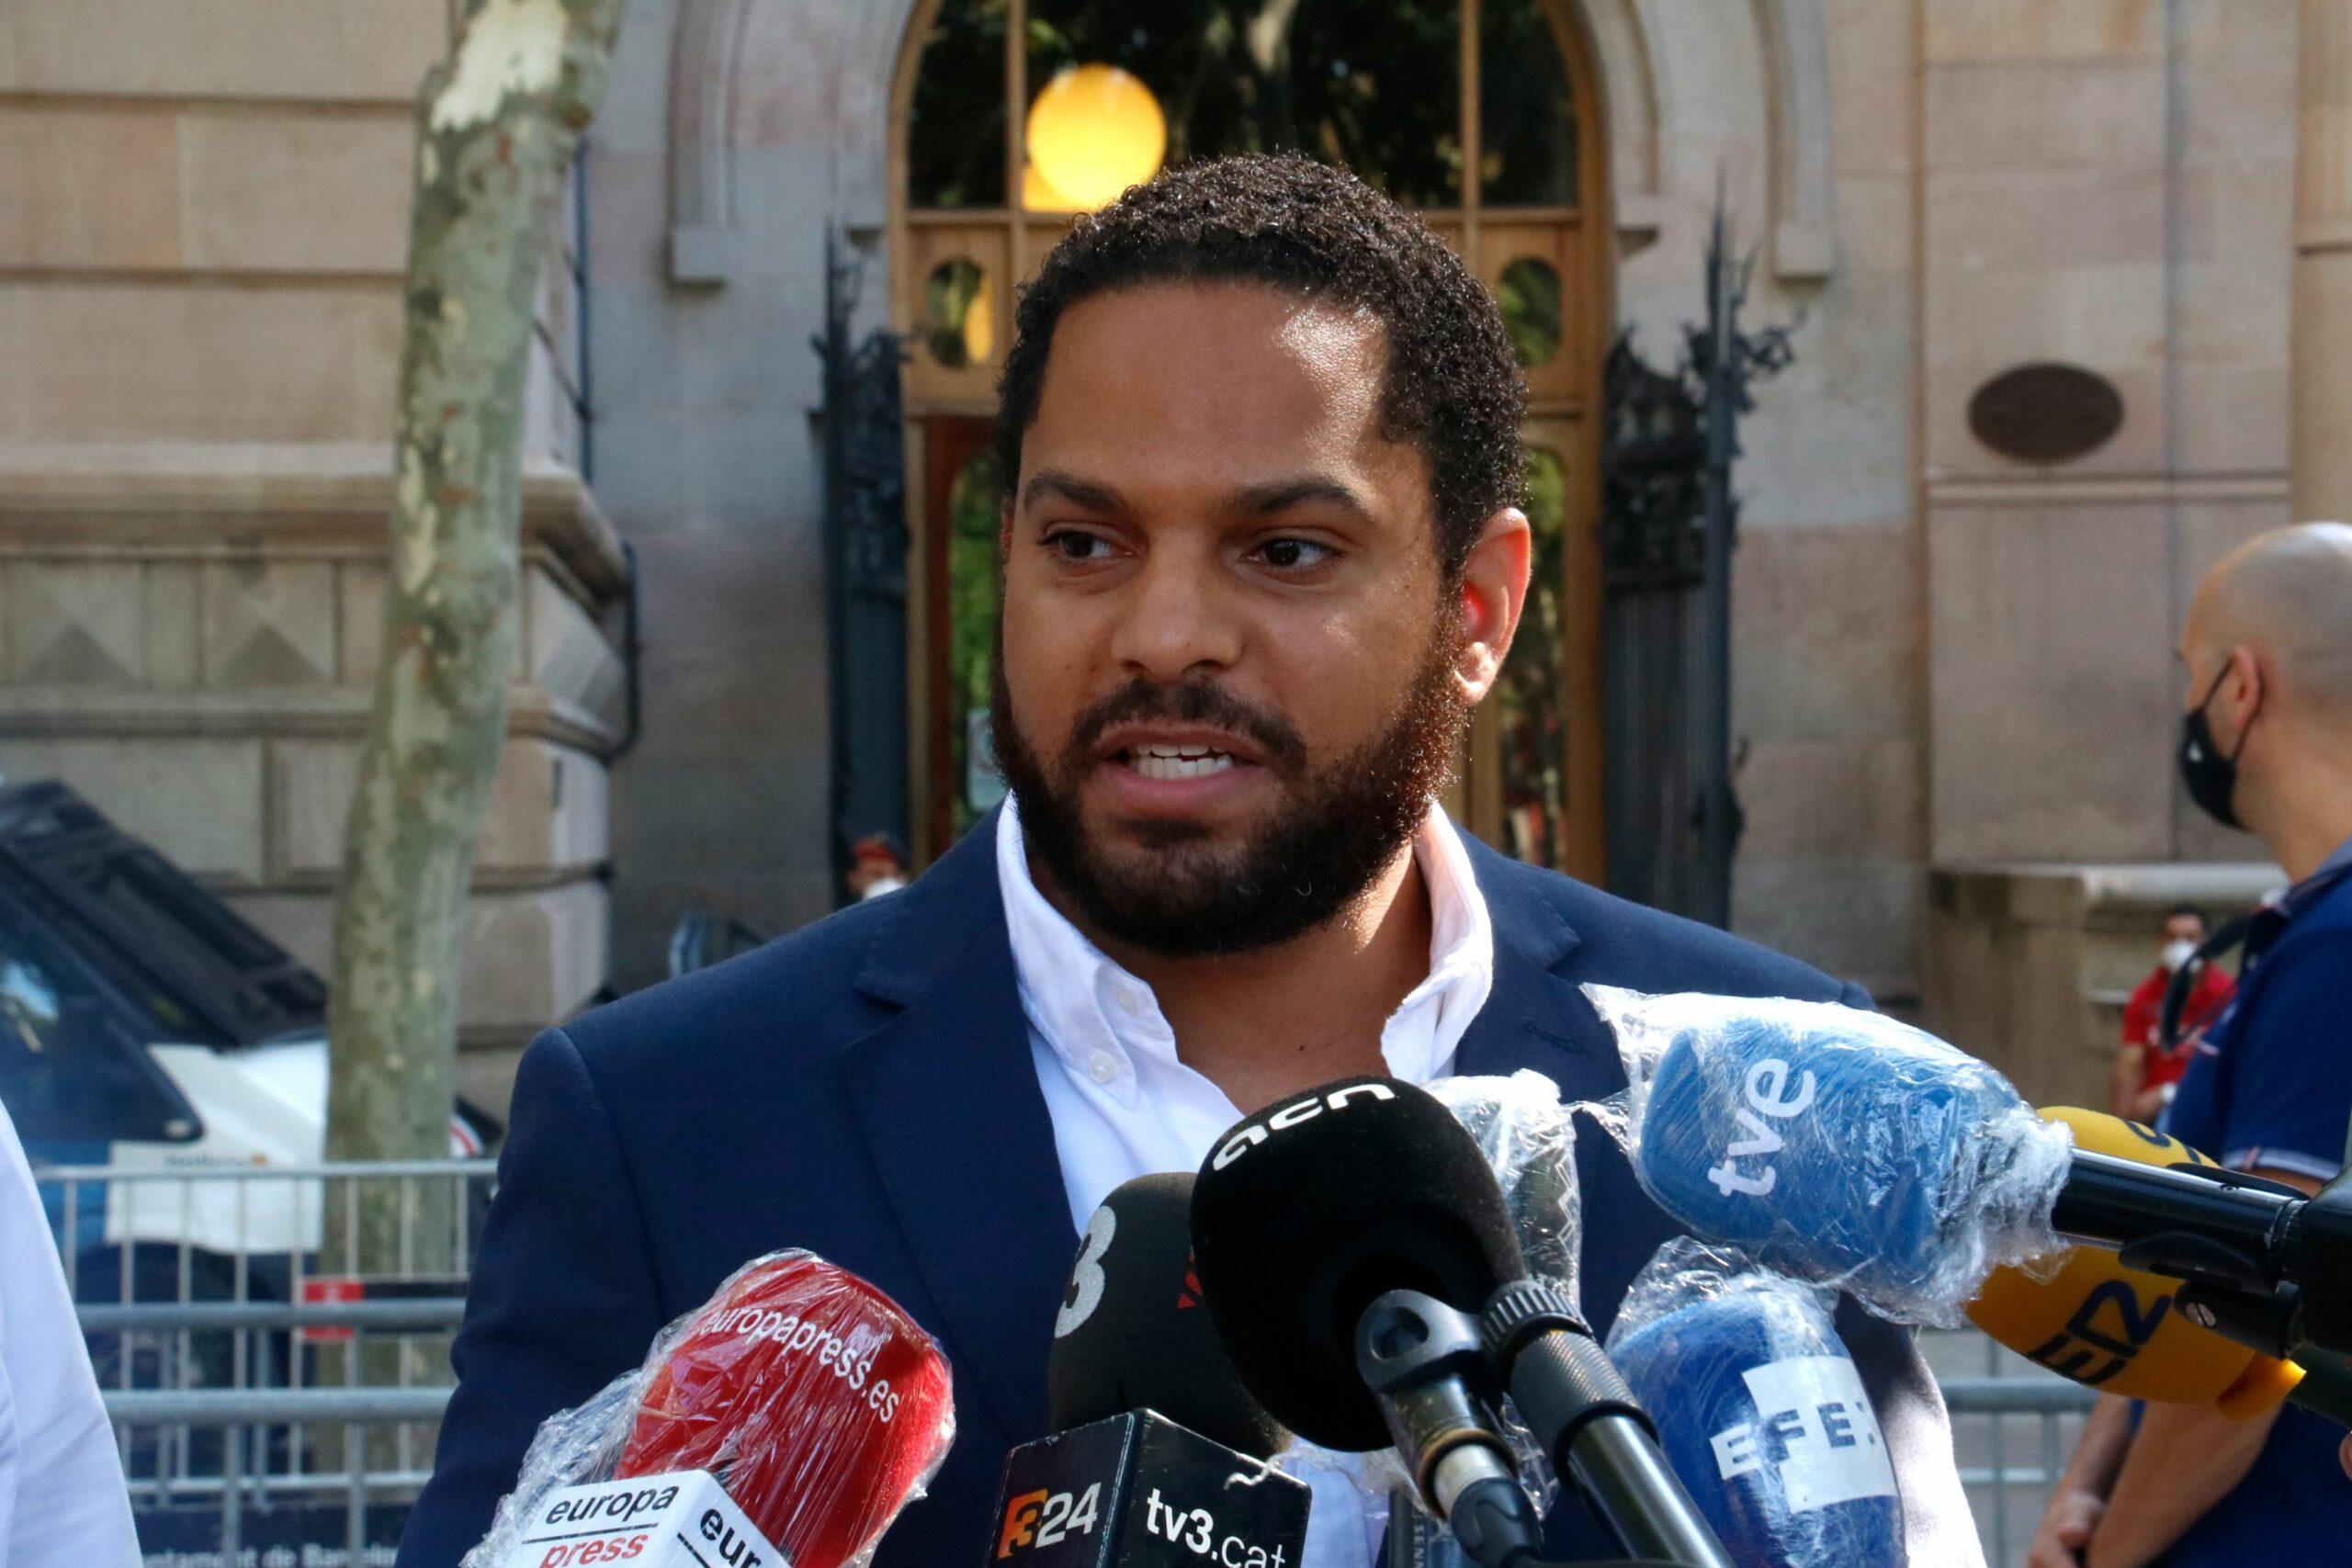 El candidat de Vox Ignacio Garriga